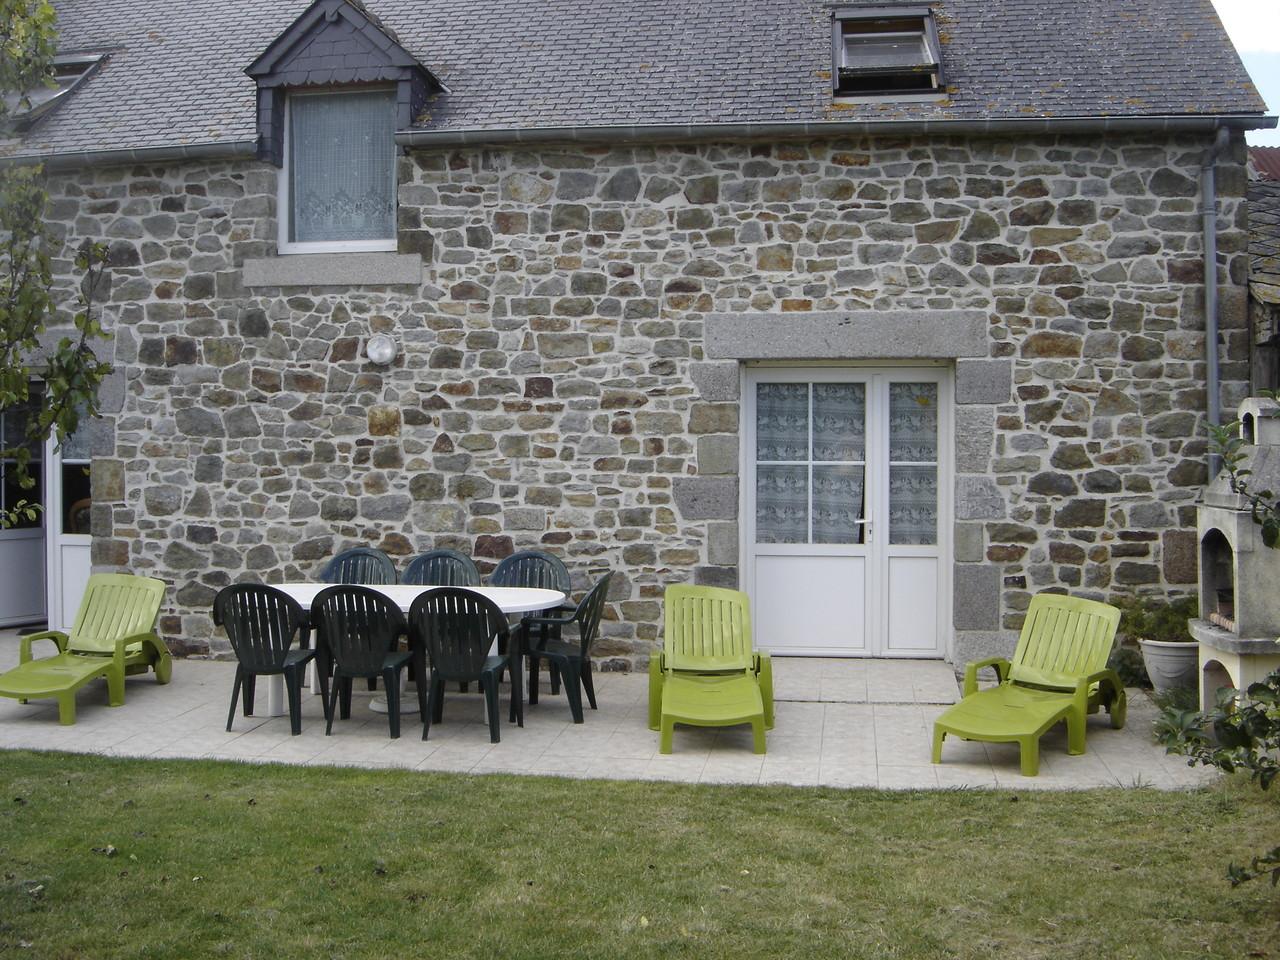 le jardin clos avec terrasse, barbecue et arbres fruitiers